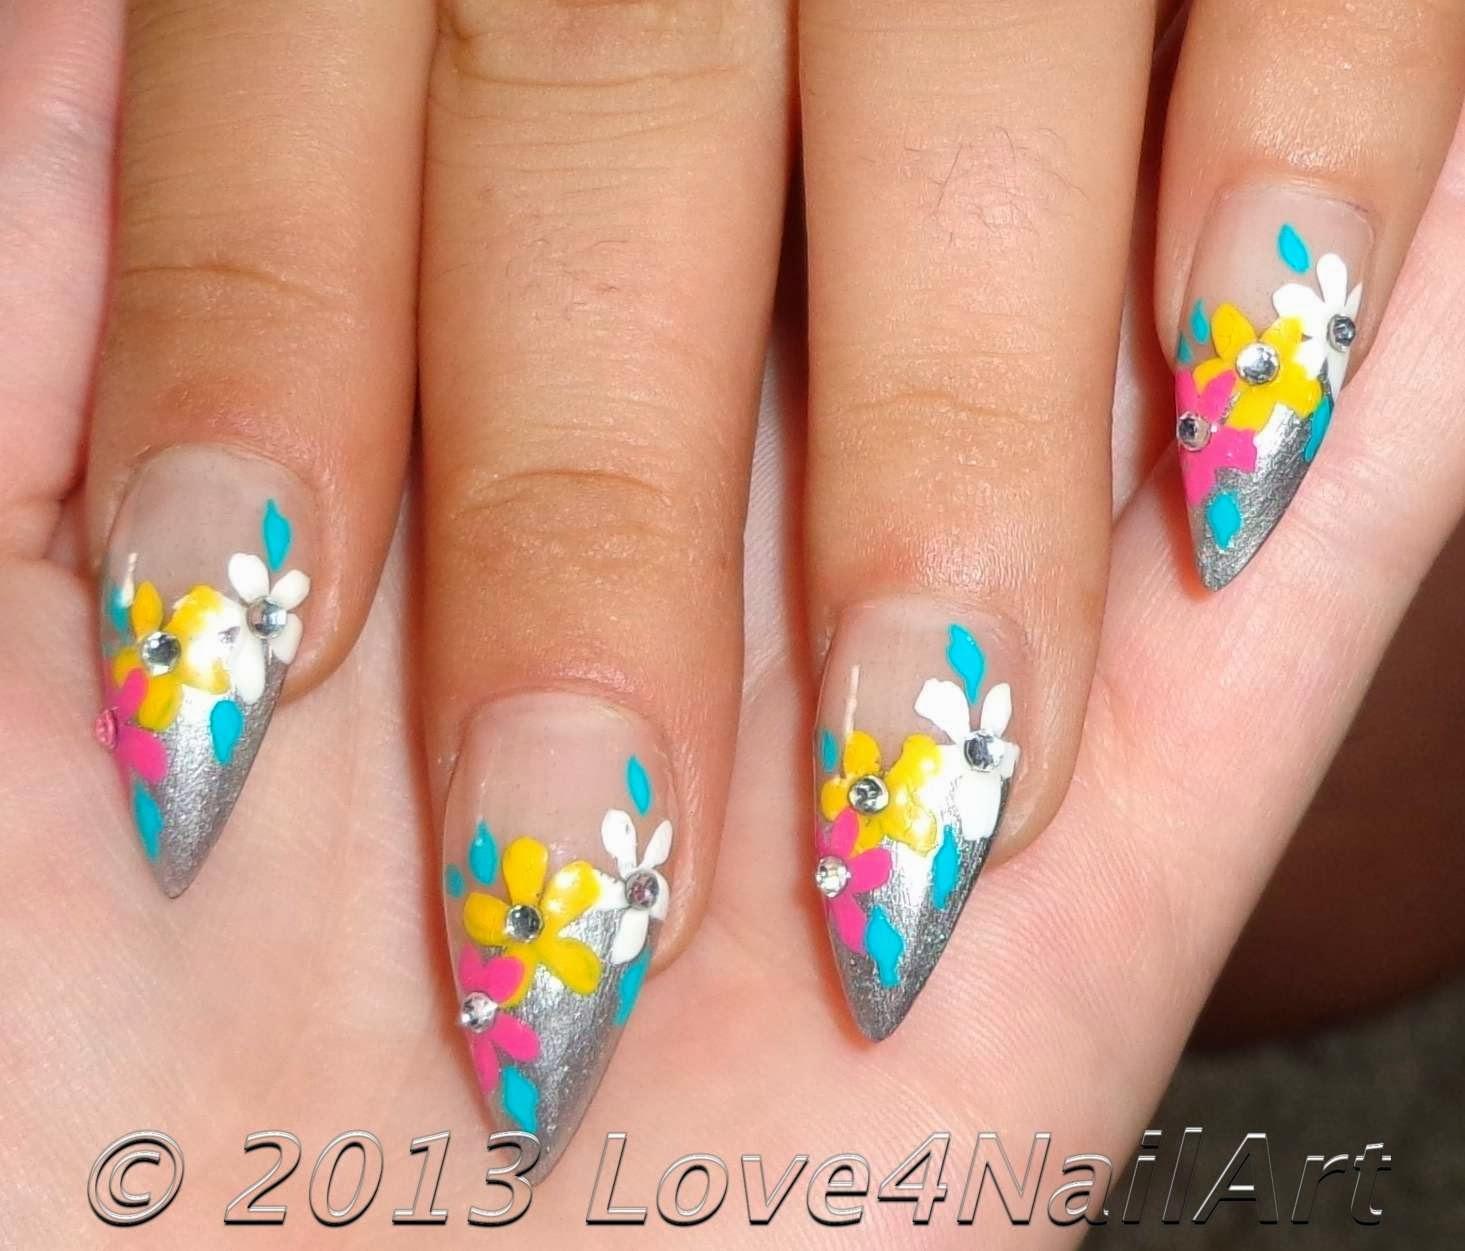 Love4NailArt: Flowery Nail Art For Stiletto Nails